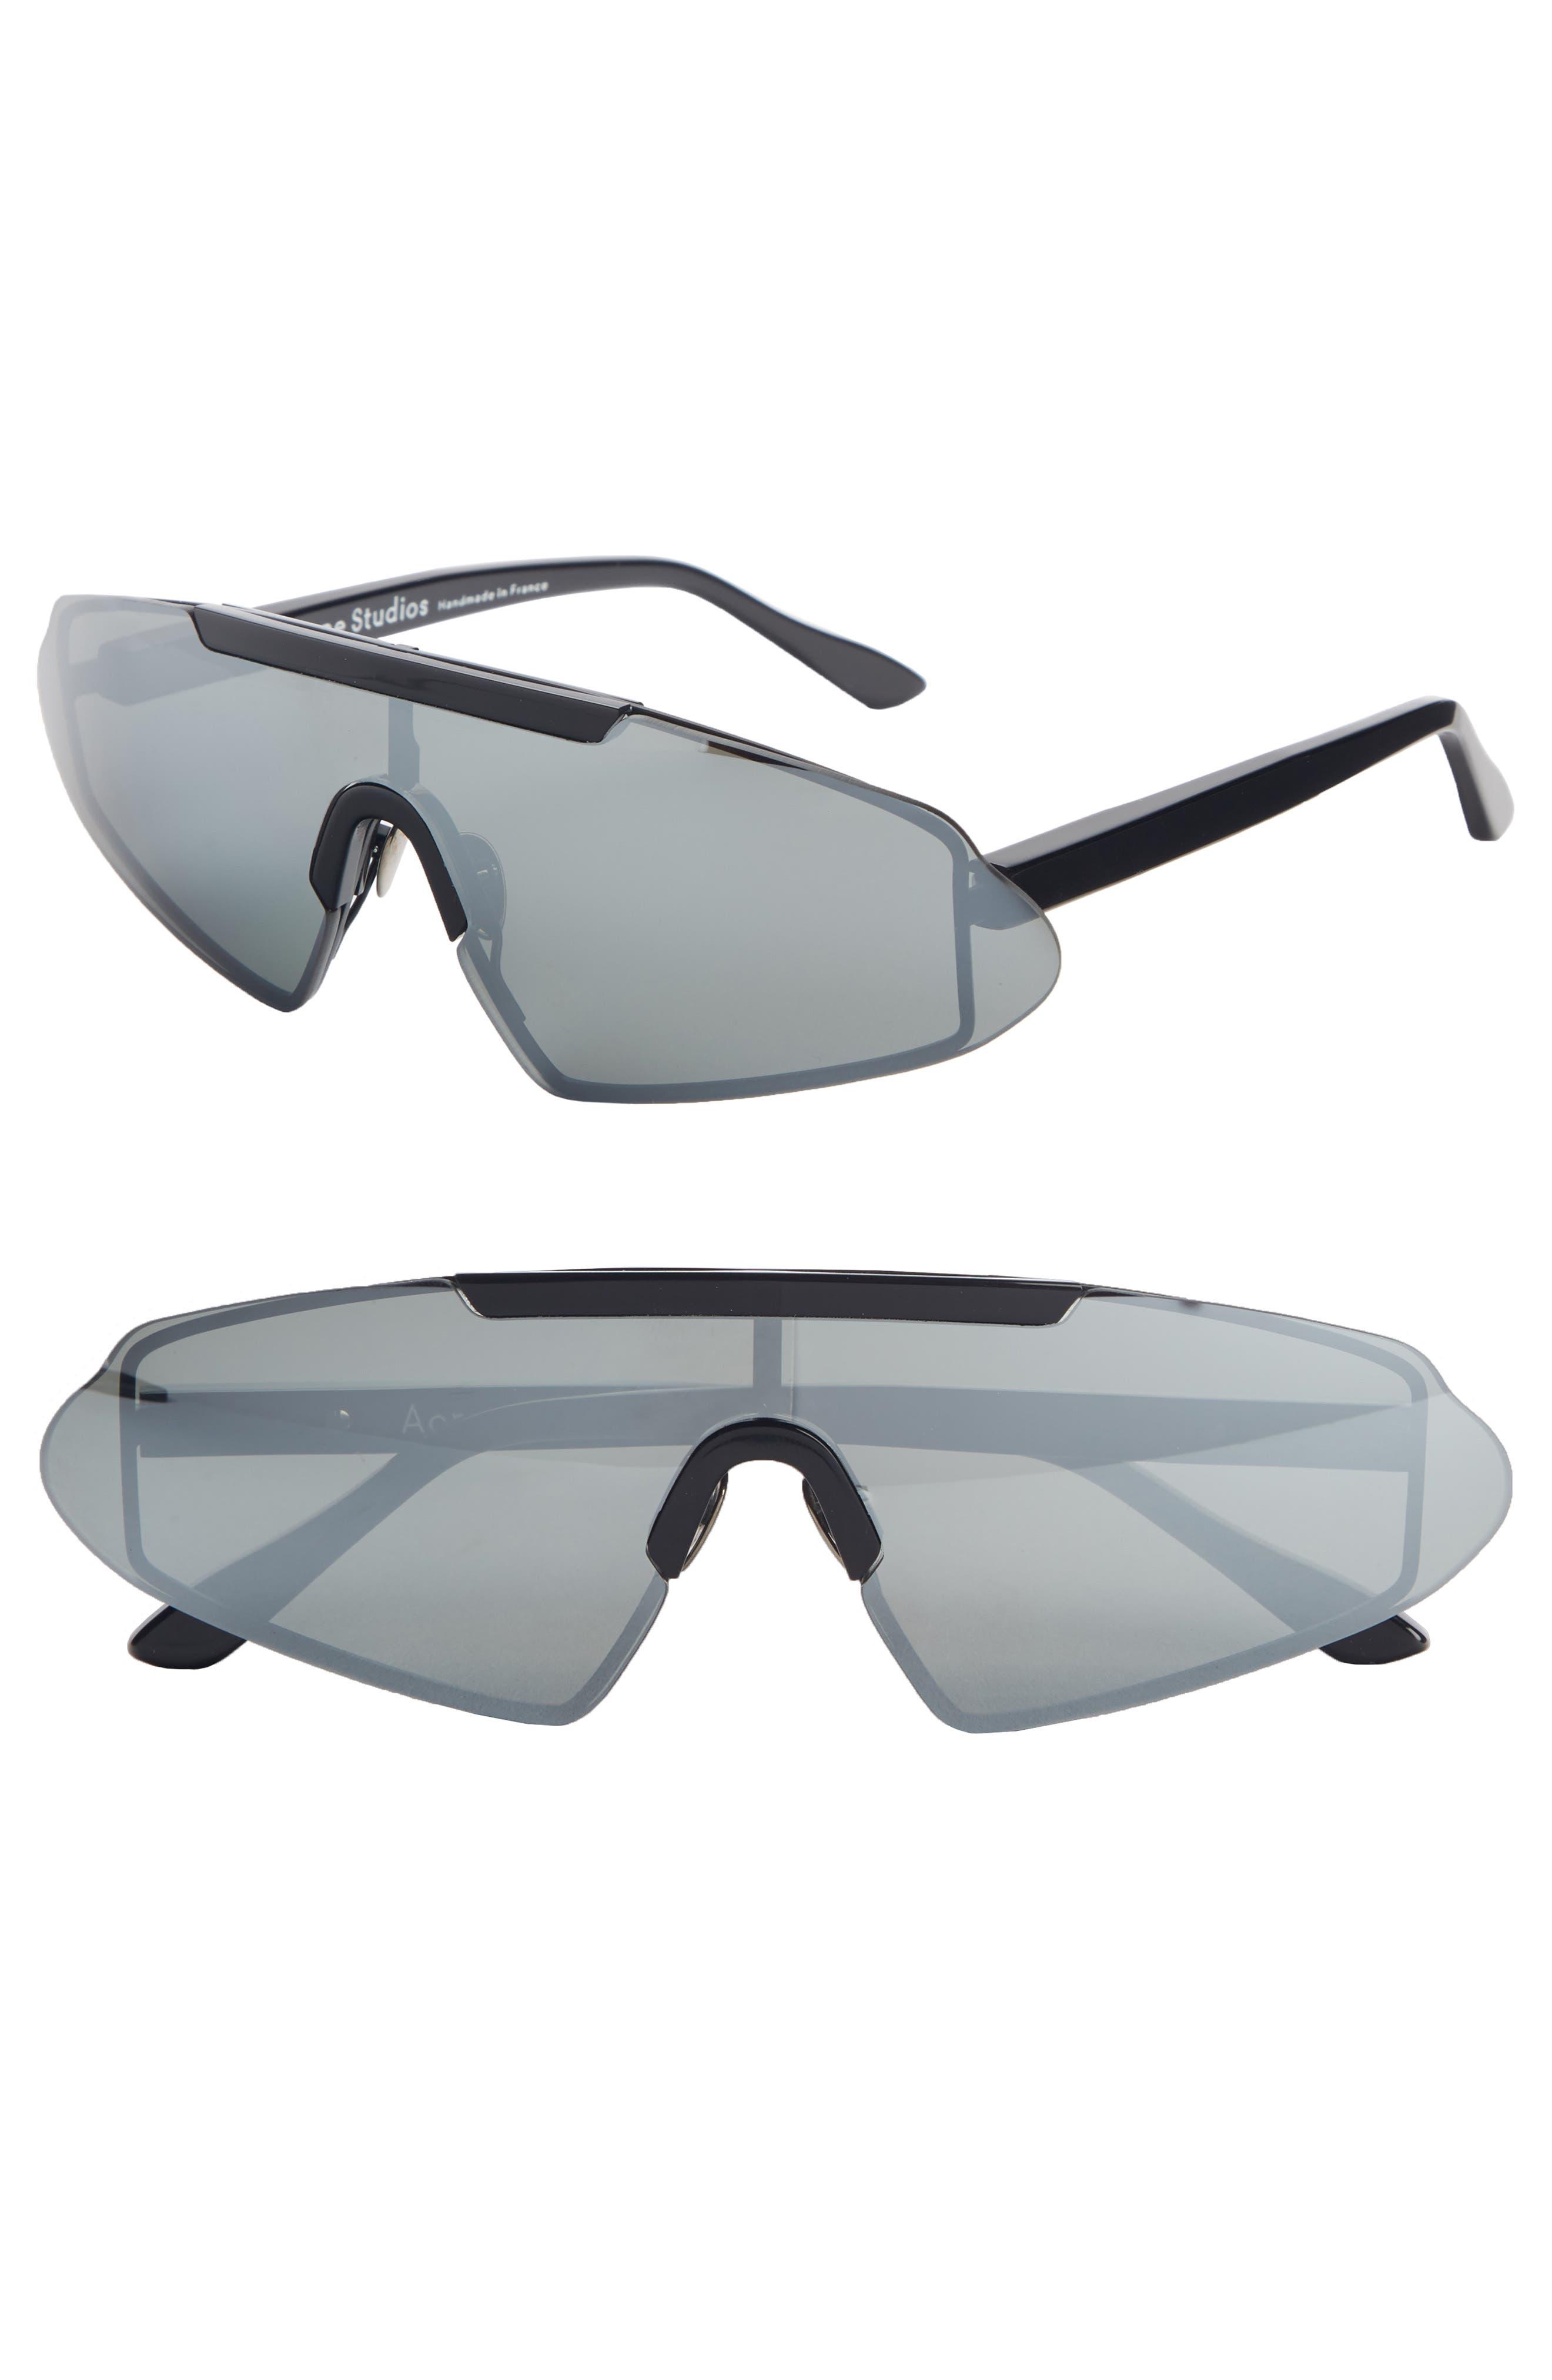 4167740fb6 Acne Studios Sunglasses for Women